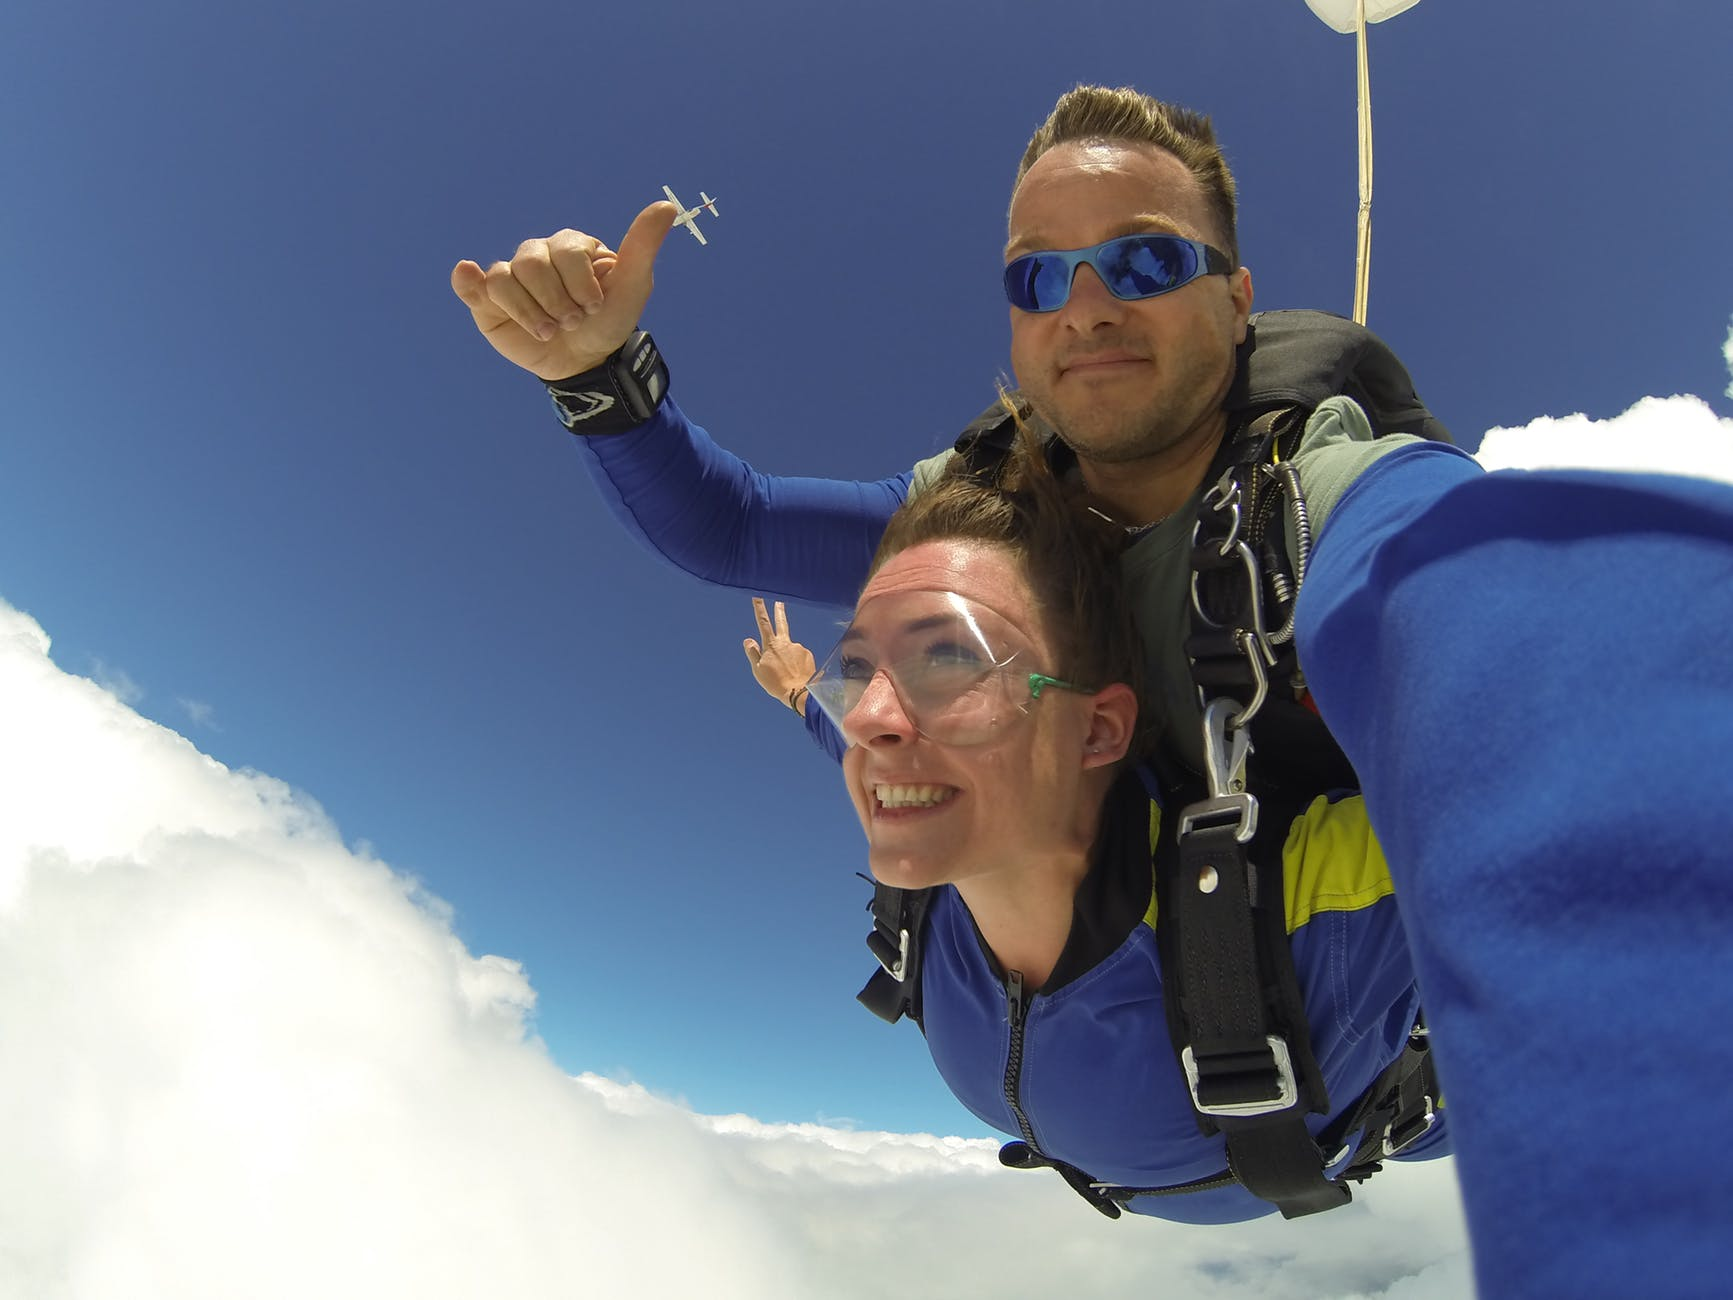 Casal saltando de paraquedas